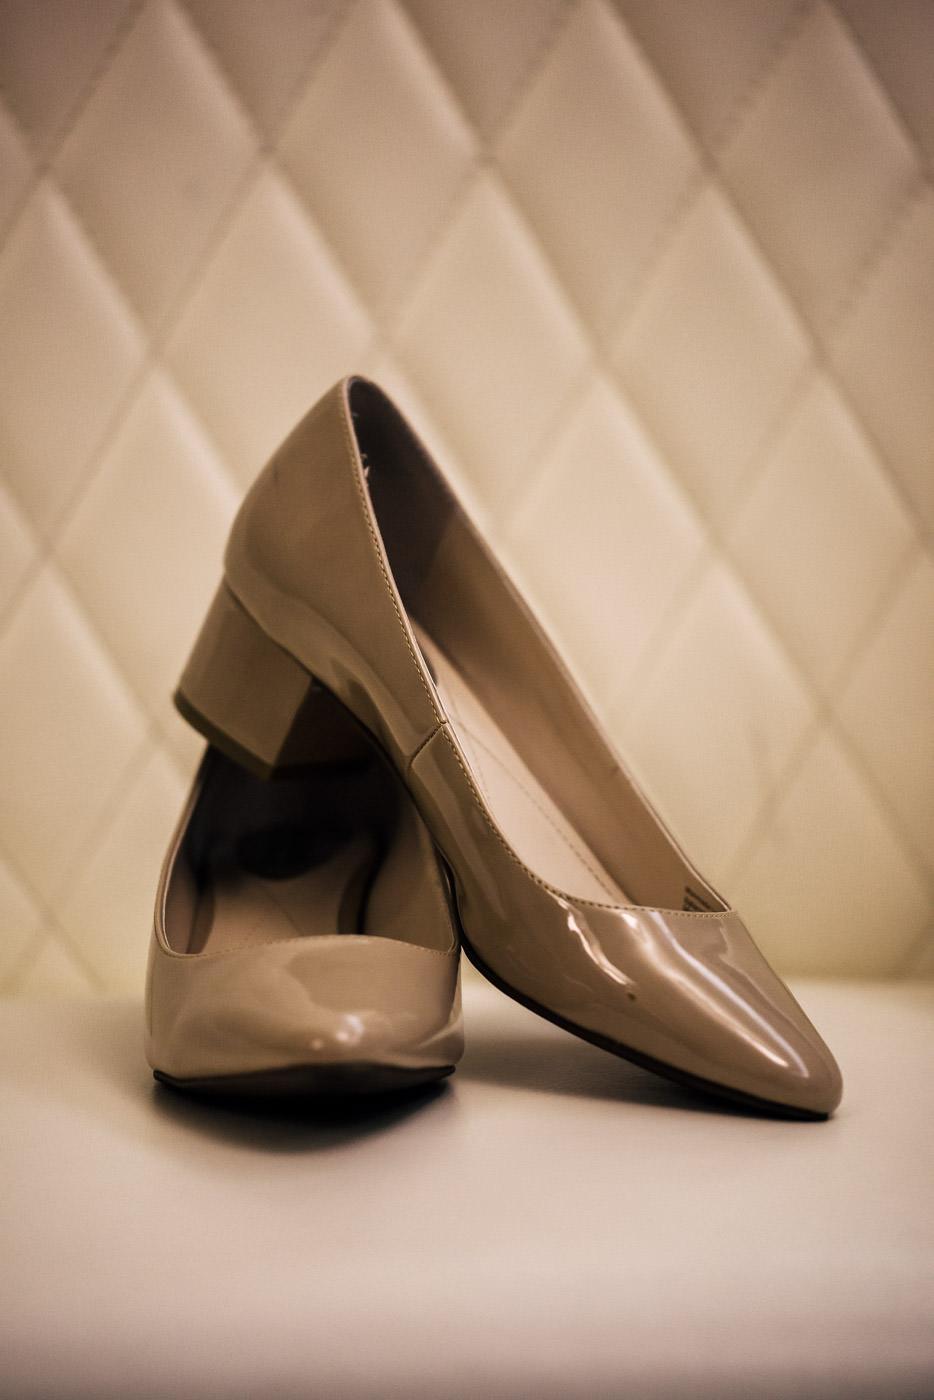 Brides beige heels for her wedding.